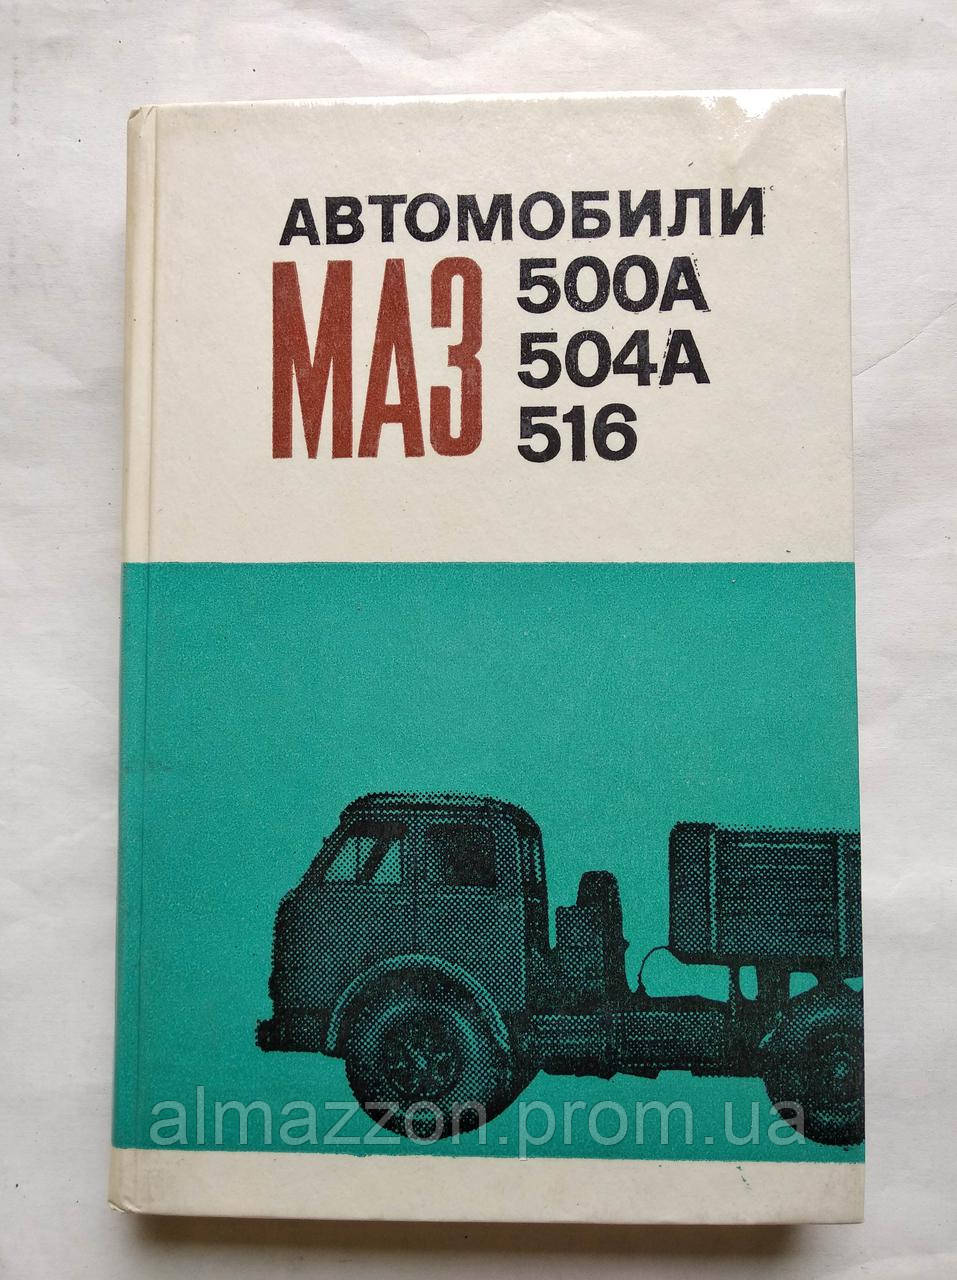 Автомобили МАЗ-500А, 504А, 516. Устройство и техническое обслуживание